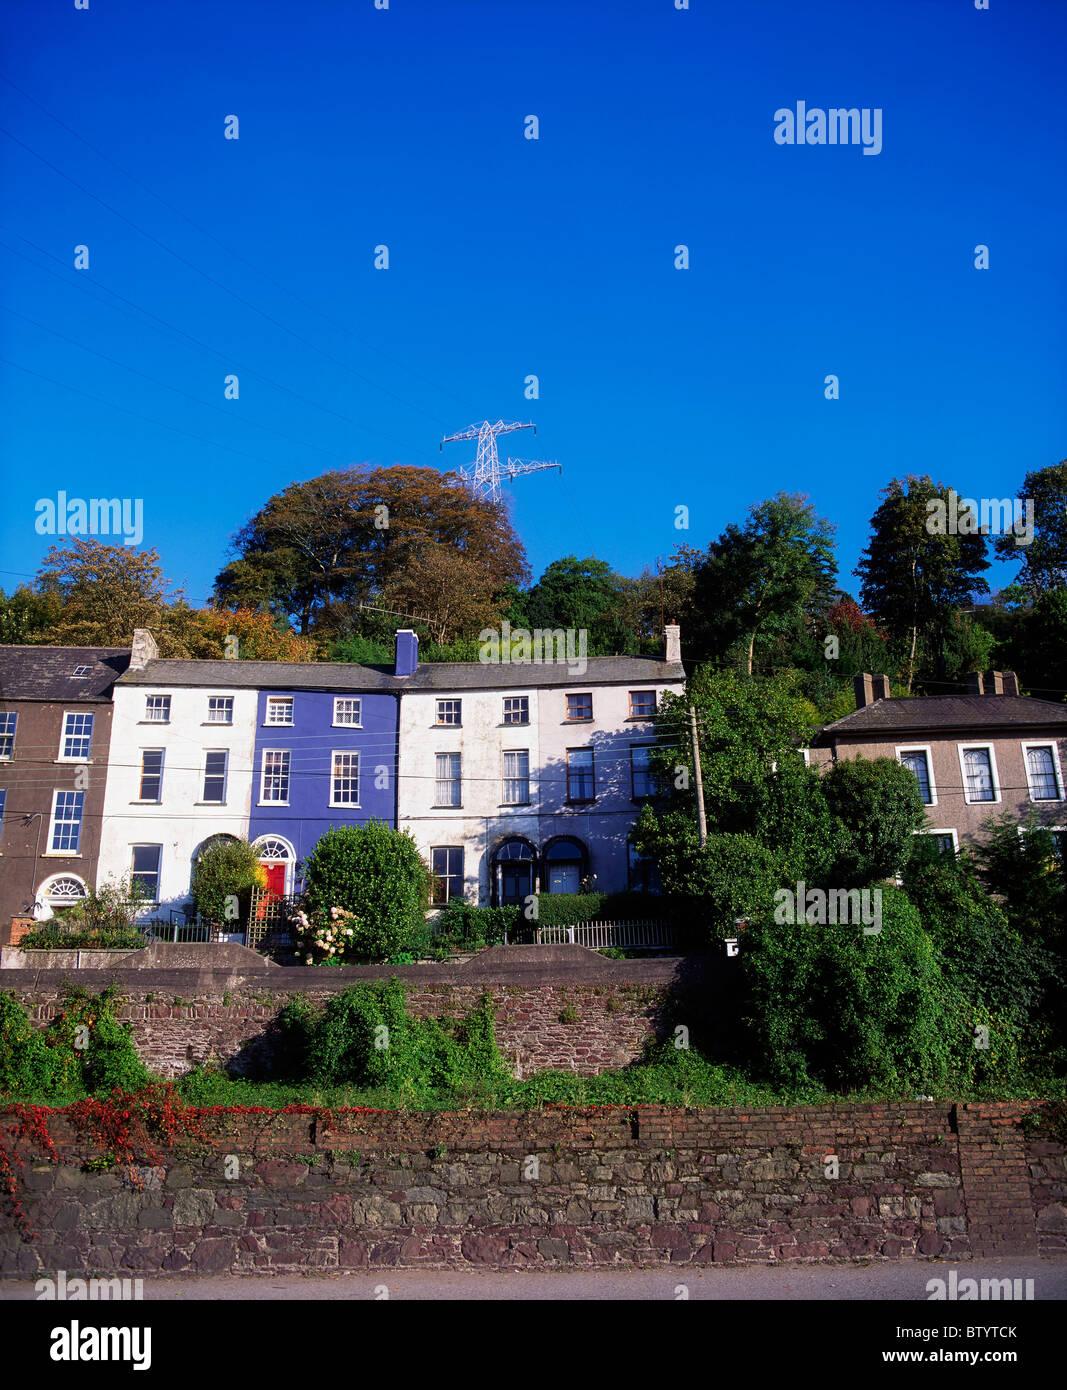 Things to Do in Glanmire, Ireland - Glanmire - TripAdvisor